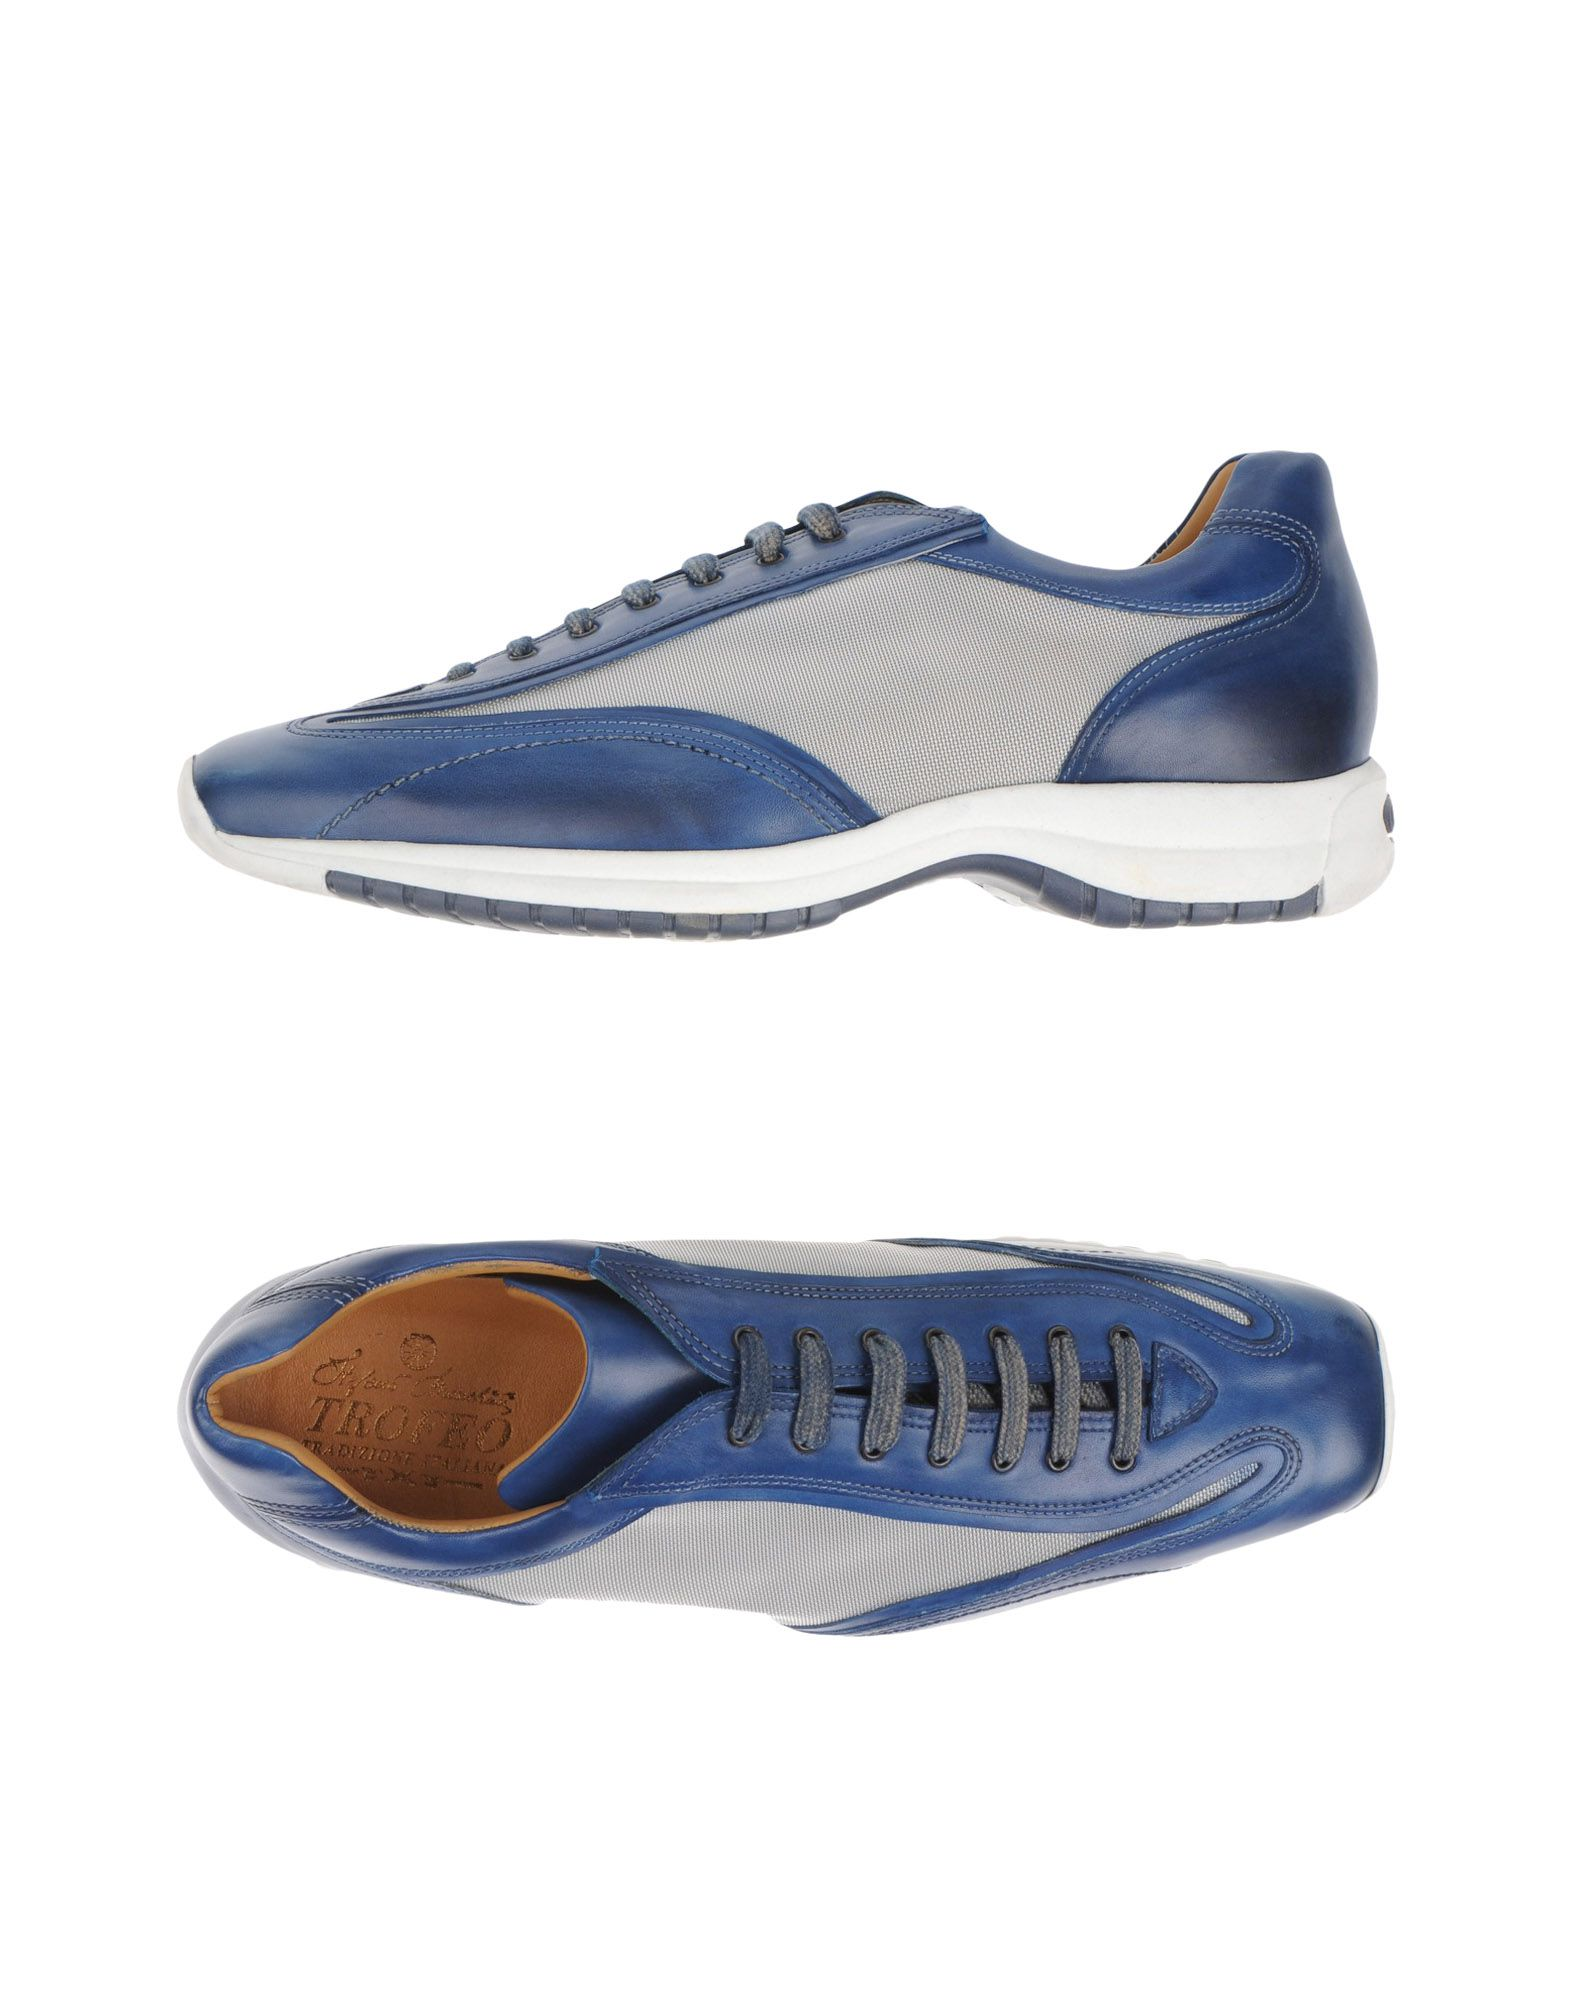 Trofeo By Stefano Branchini Sneakers Herren  11381812ME Heiße Schuhe